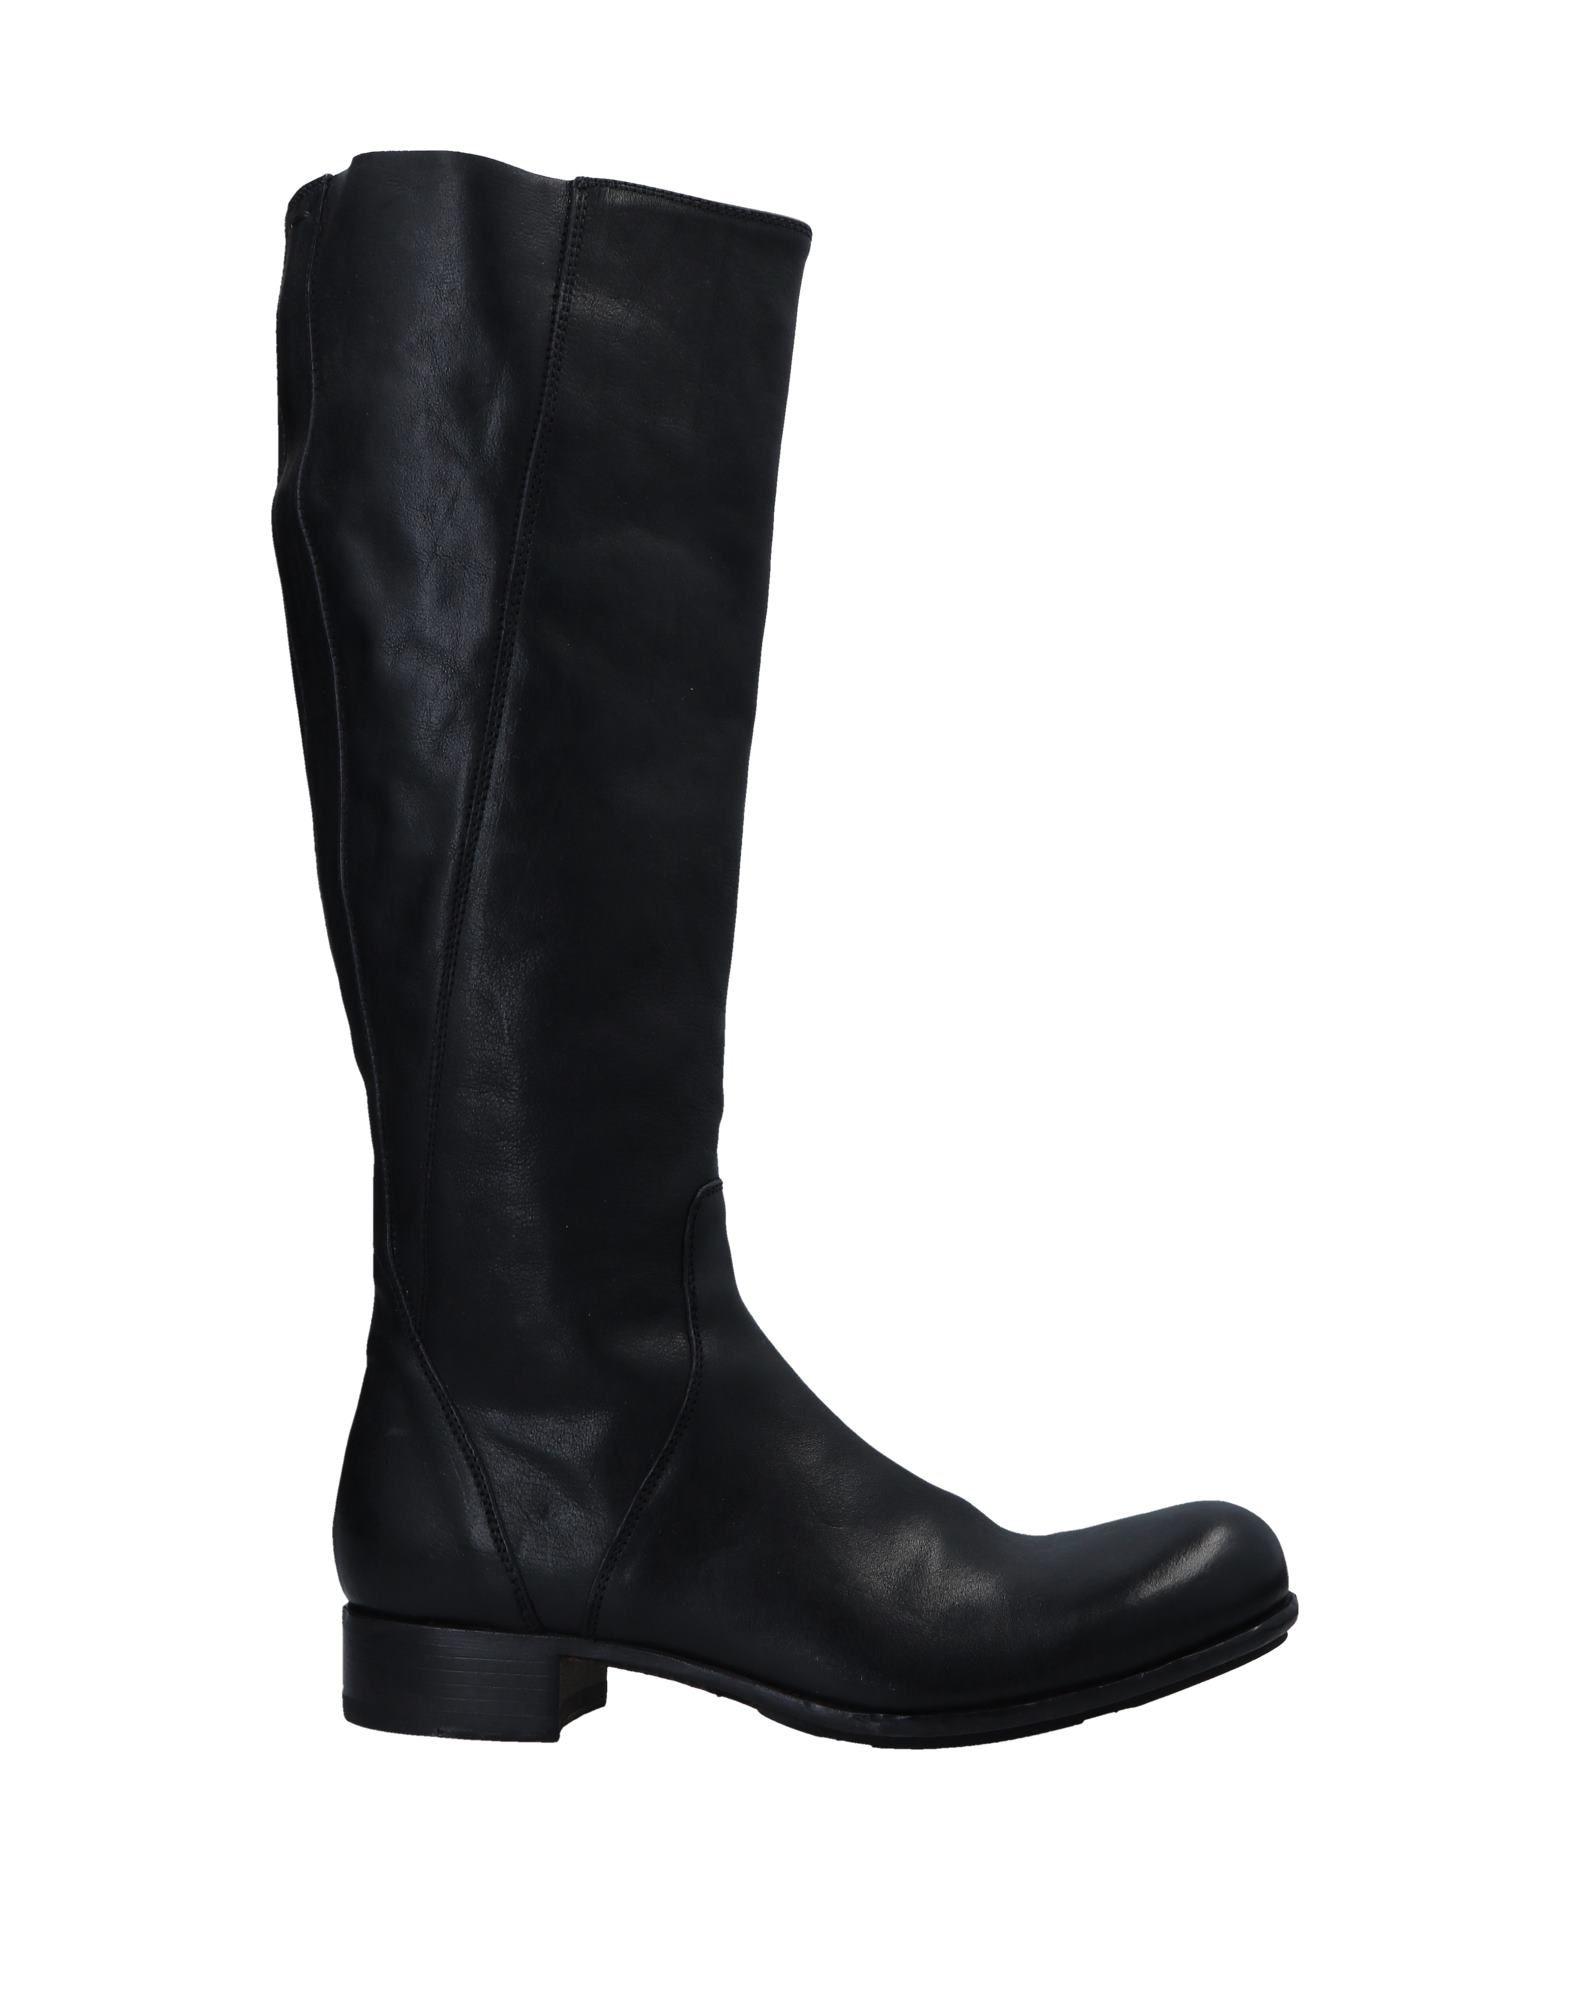 Pantanetti Stiefel Damen  11546471AEGut aussehende strapazierfähige Schuhe